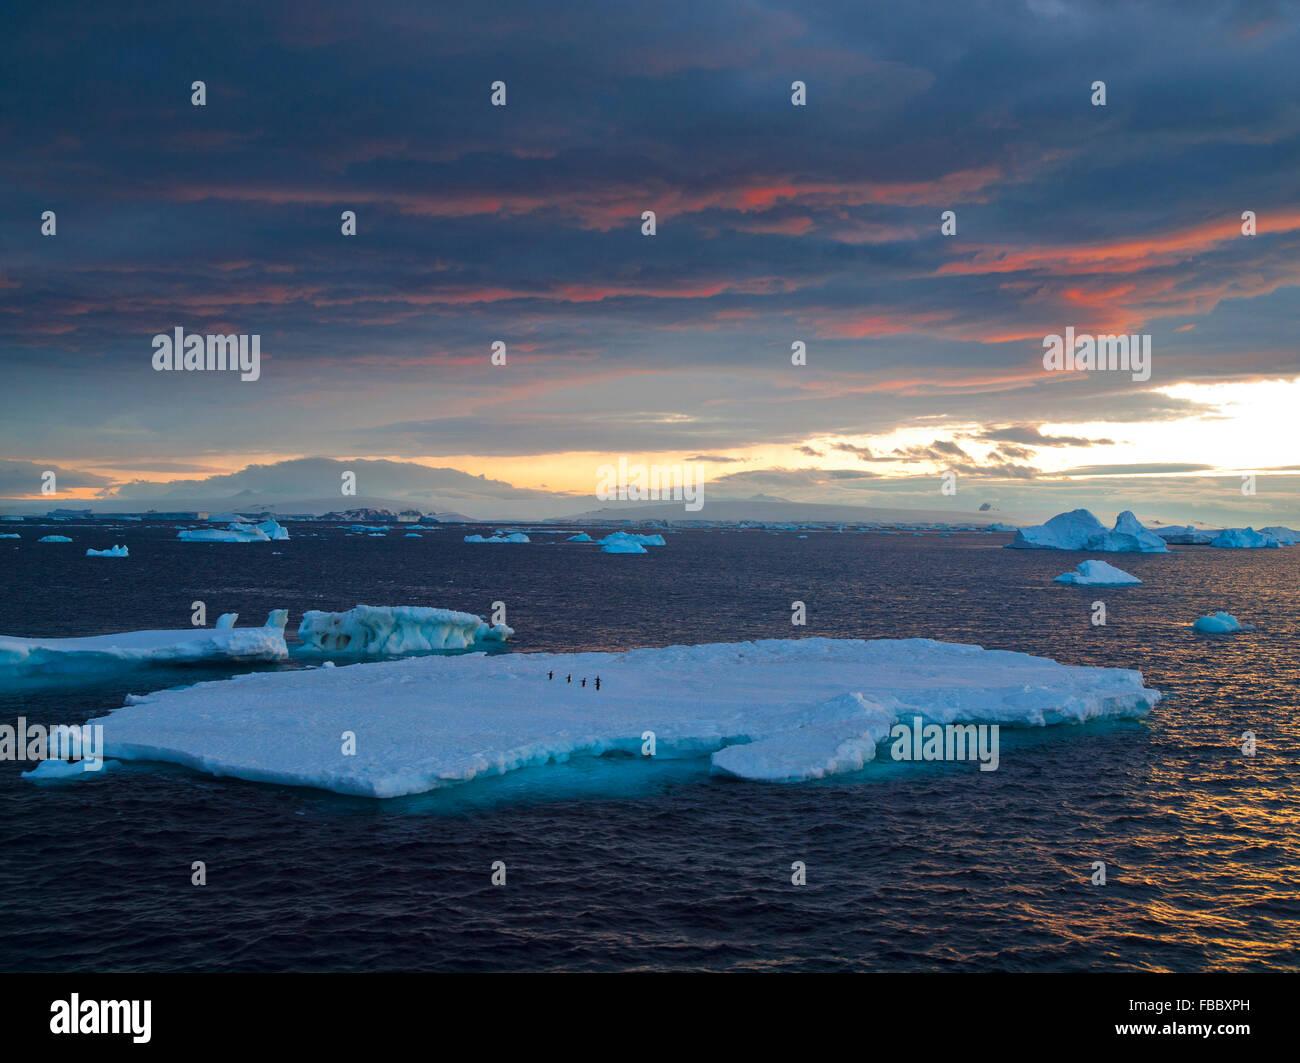 Iceberg sunrise, Antarctic peninsula - Stock Image